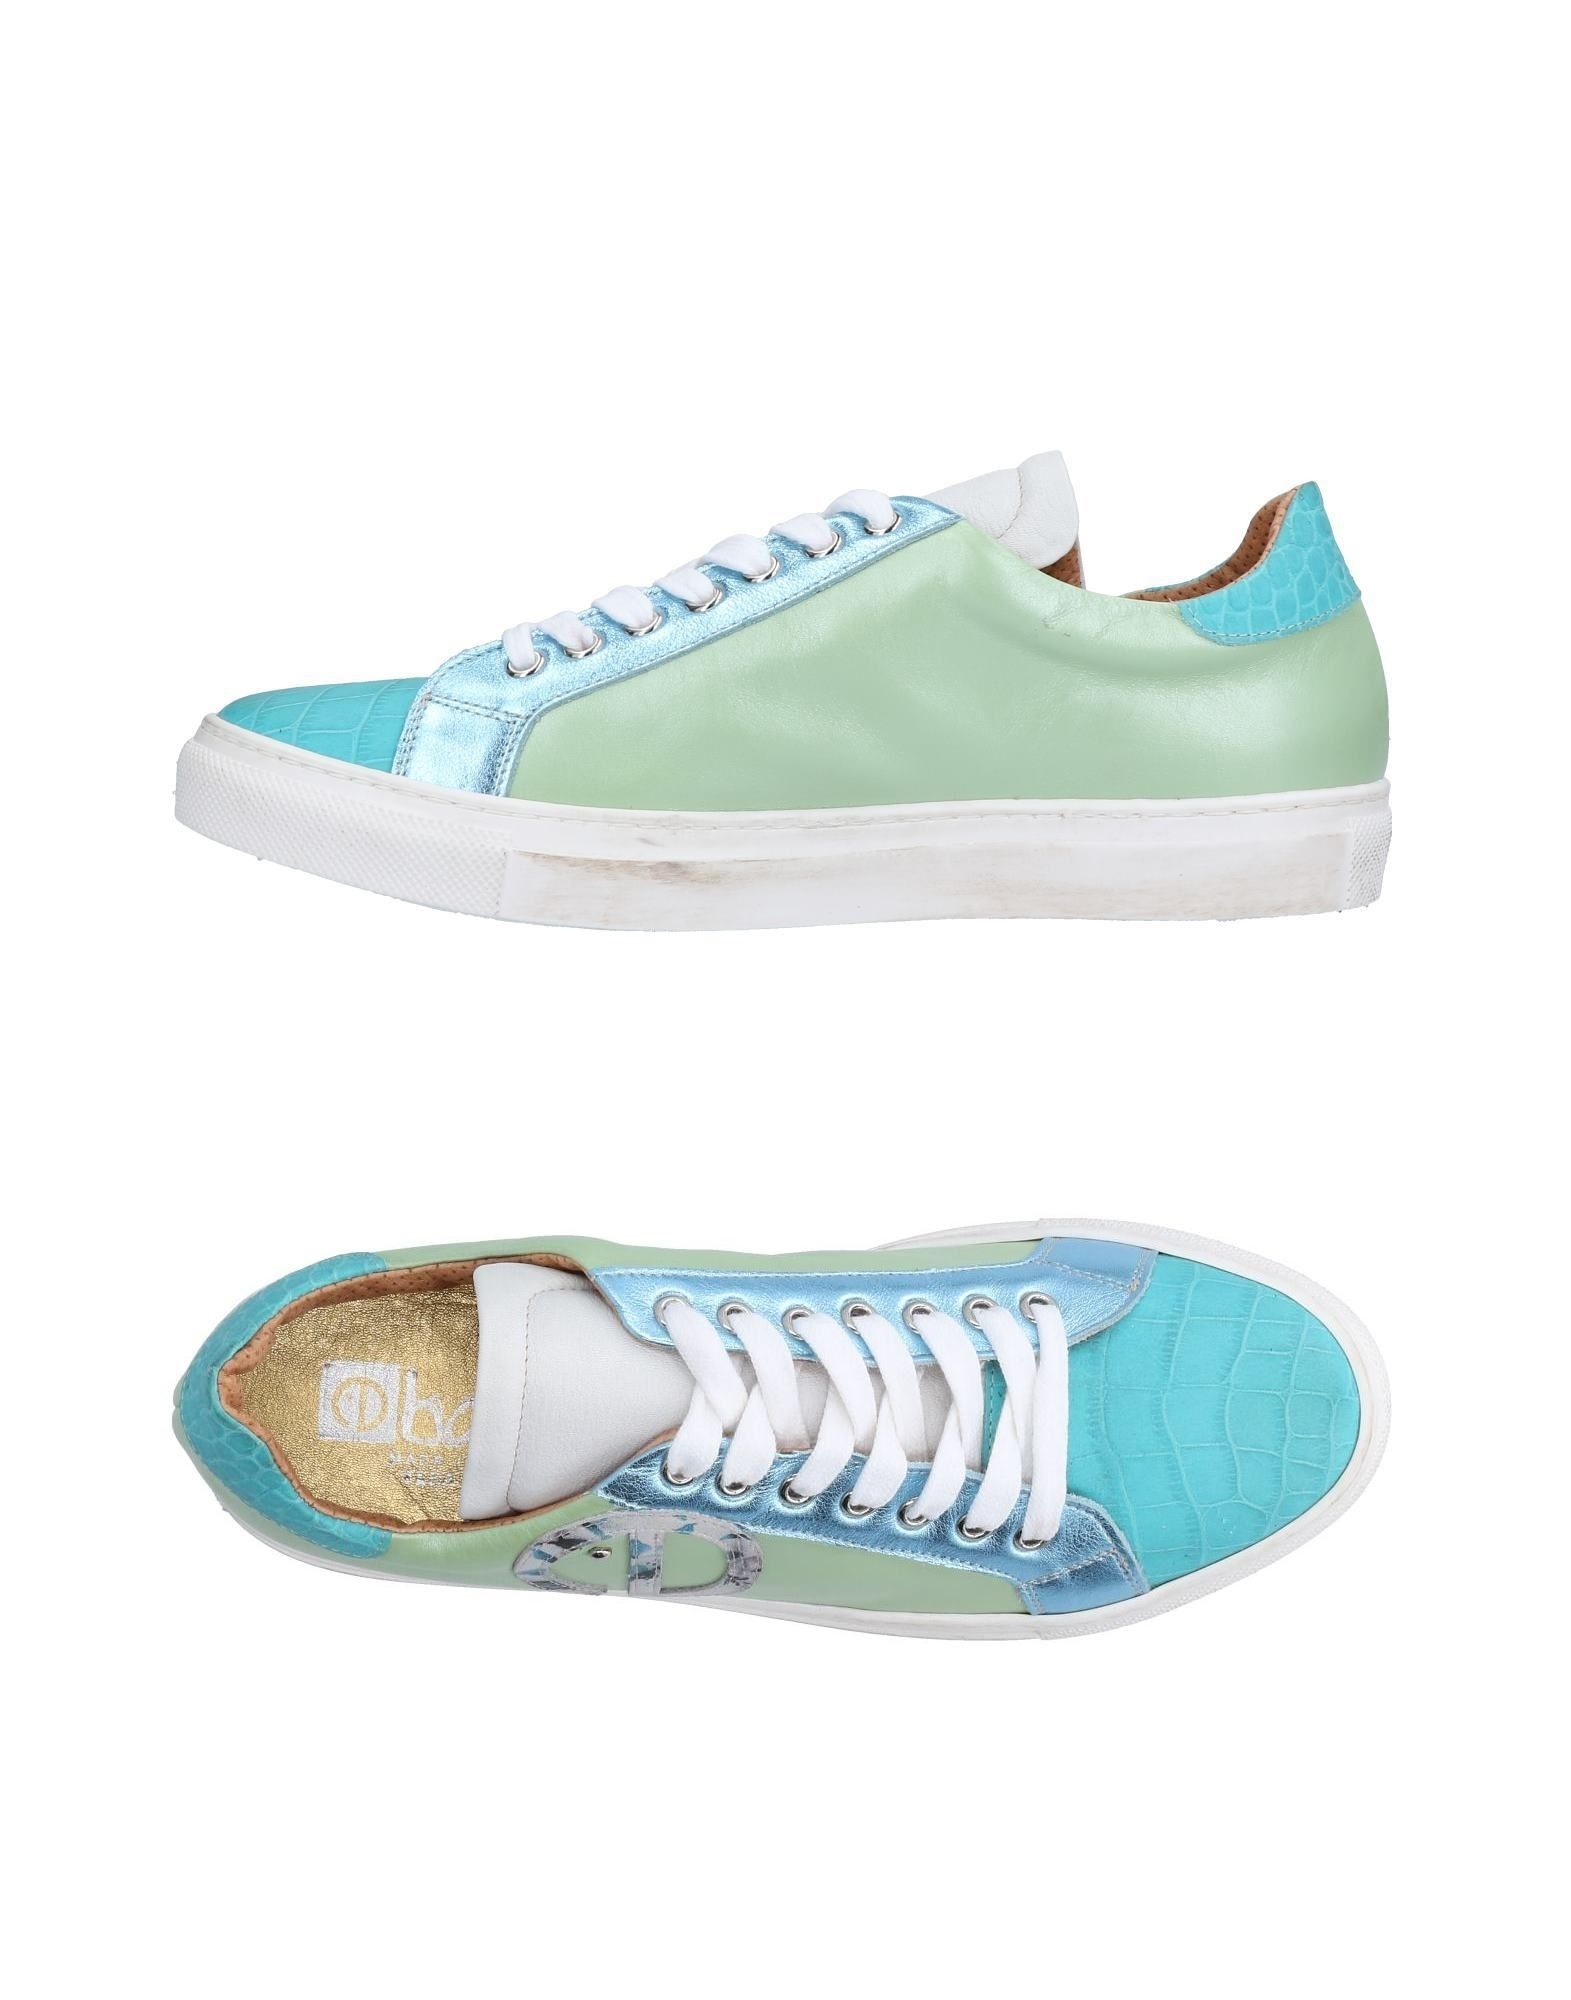 Ebarrito Ebarrito Ebarrito Sneakers - Women Ebarrito Sneakers online on  United Kingdom - 11519019QK 25fe6f